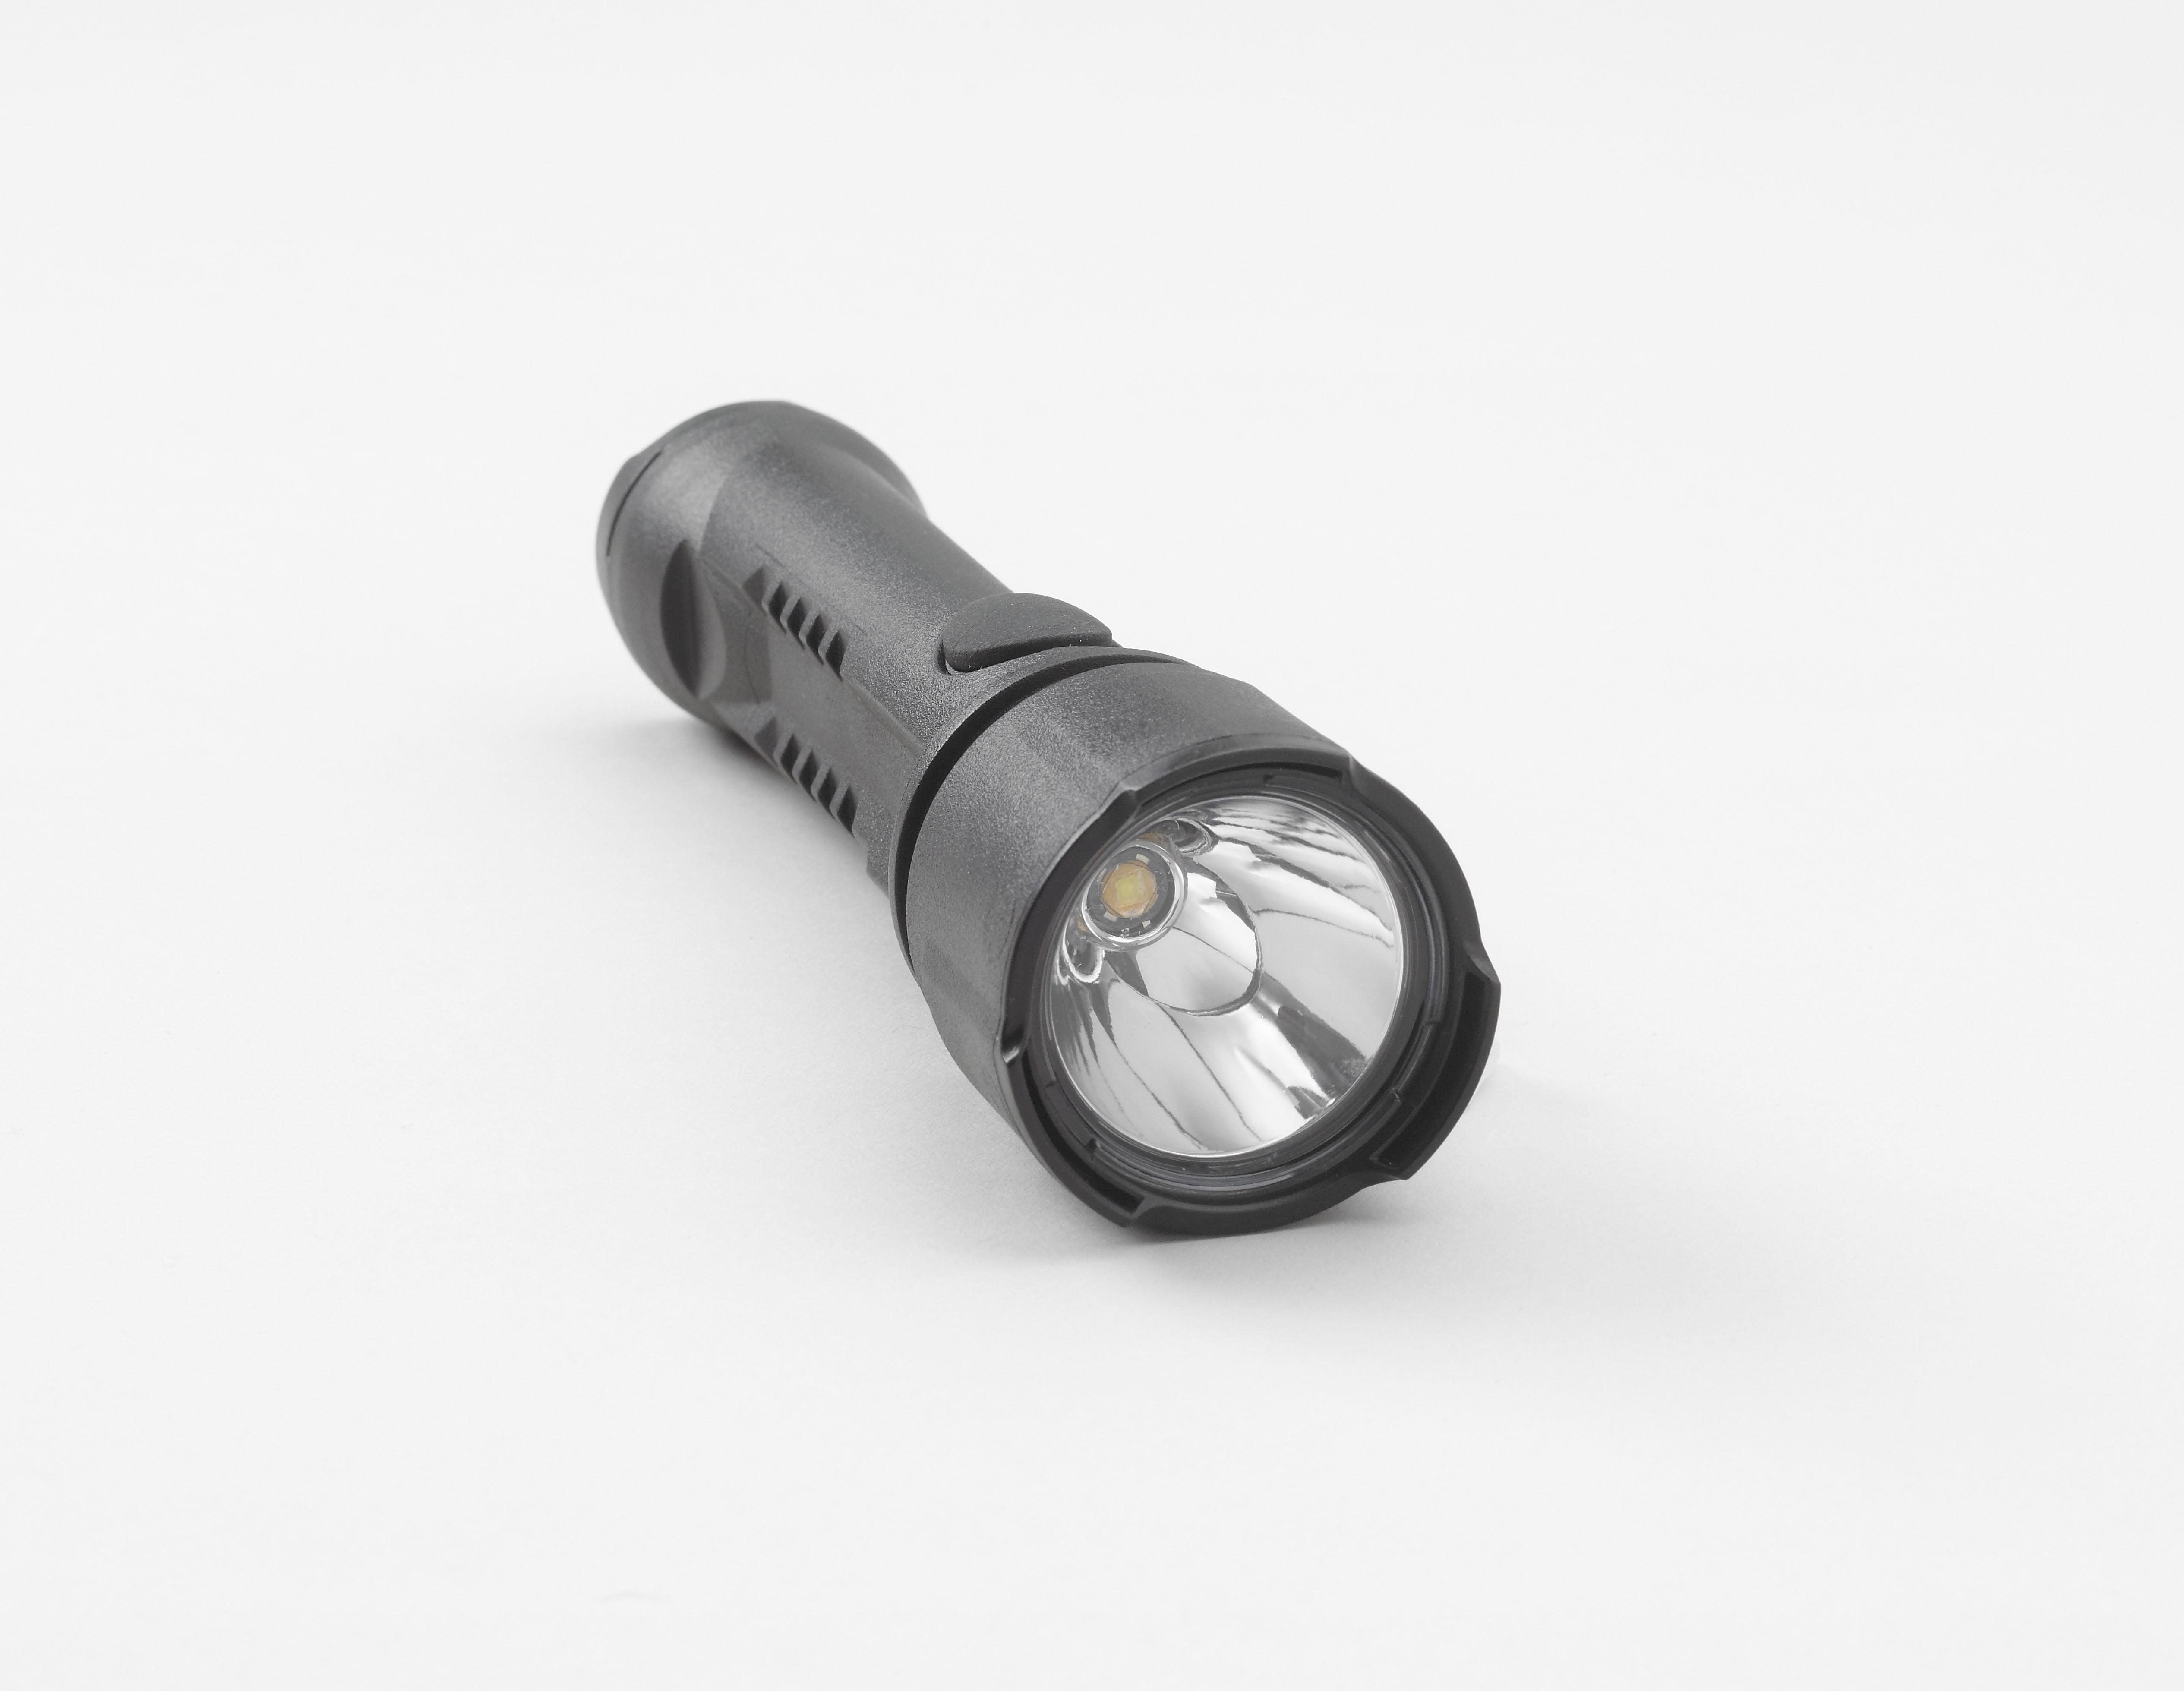 Intrinsically Safe Flashlight Koehler Brightstar Razor LED 60100 Front View